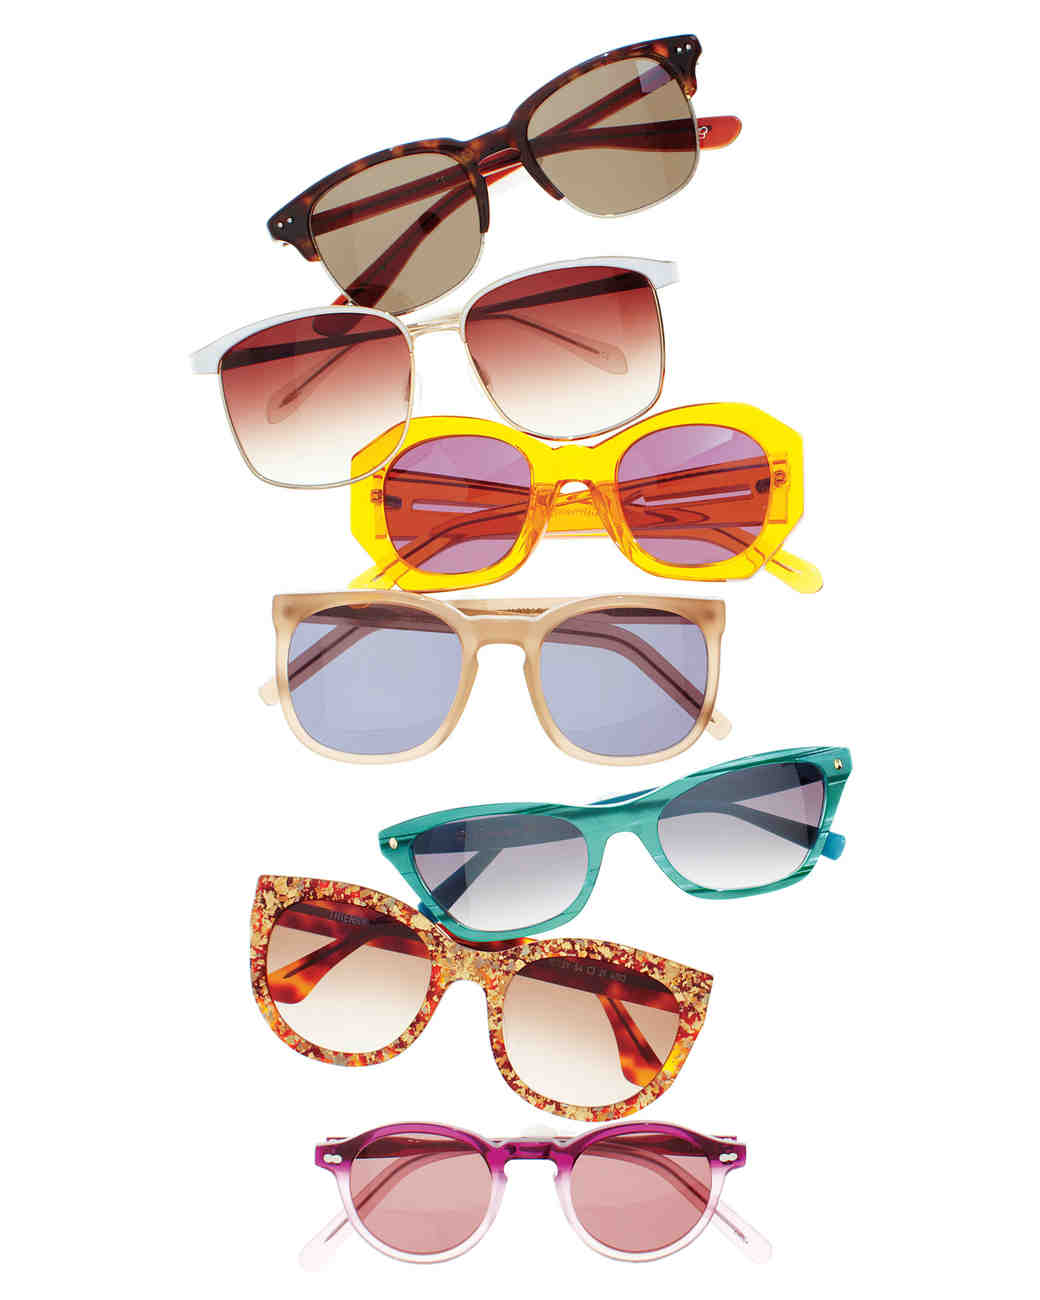 travel-accessories-sunglasses-mwd107604.jpg